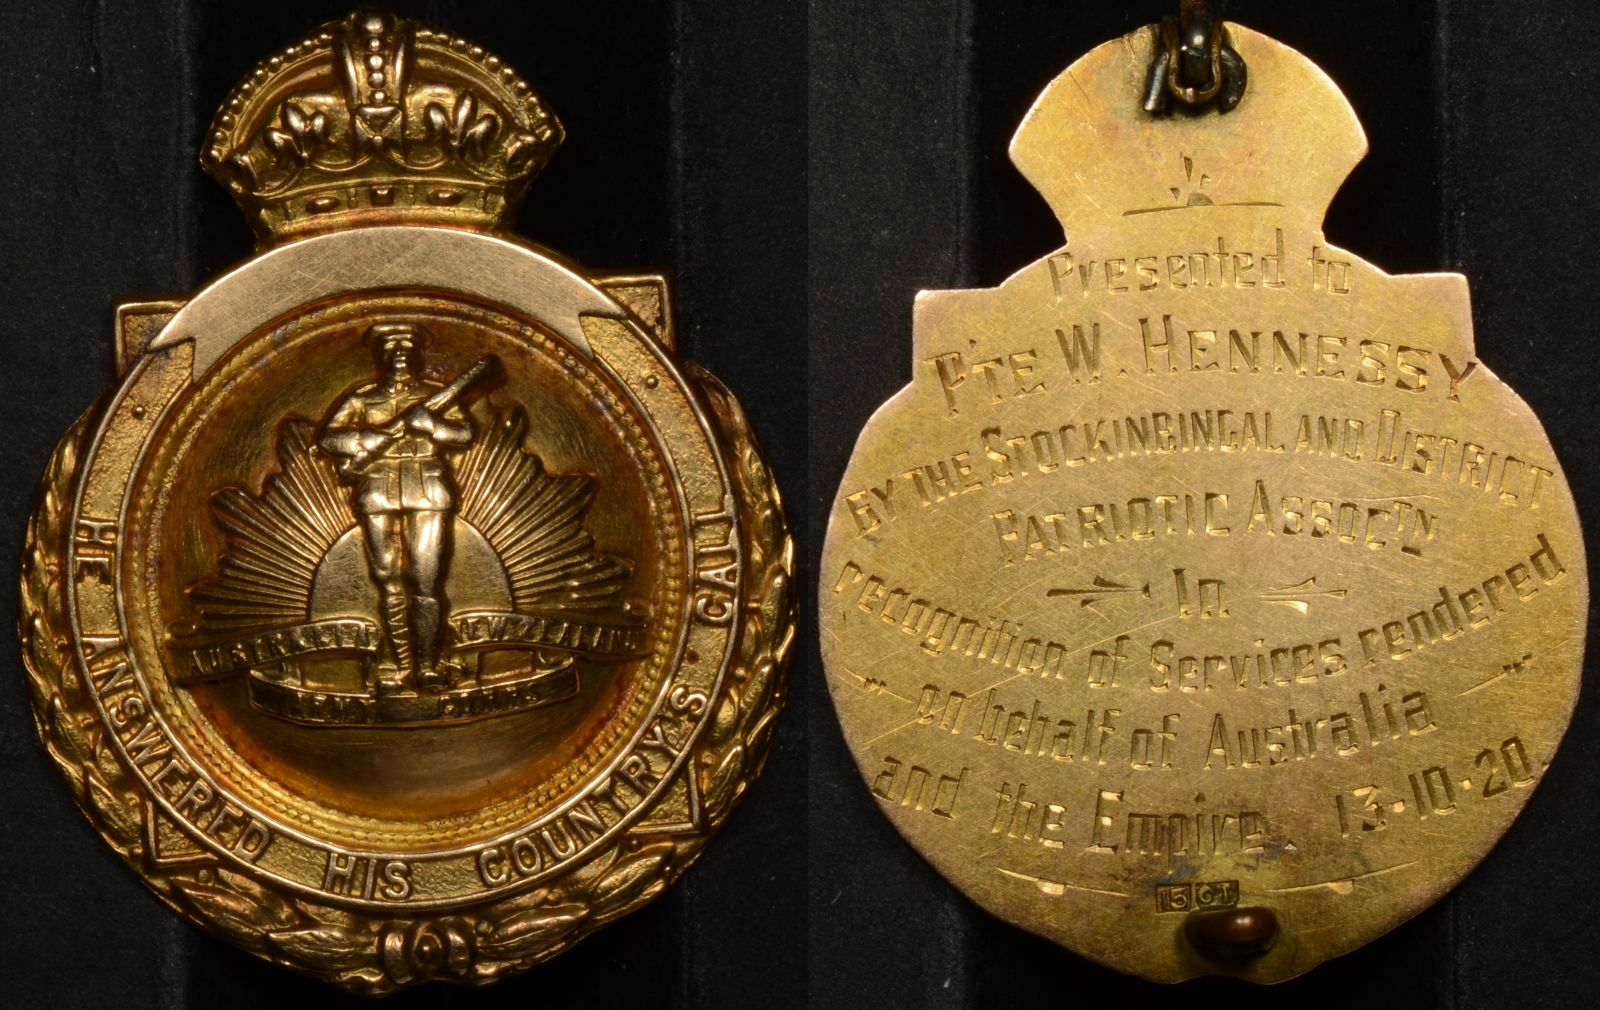 Australian World War 1 15ct Gold Return Fob William Hennessy 87037